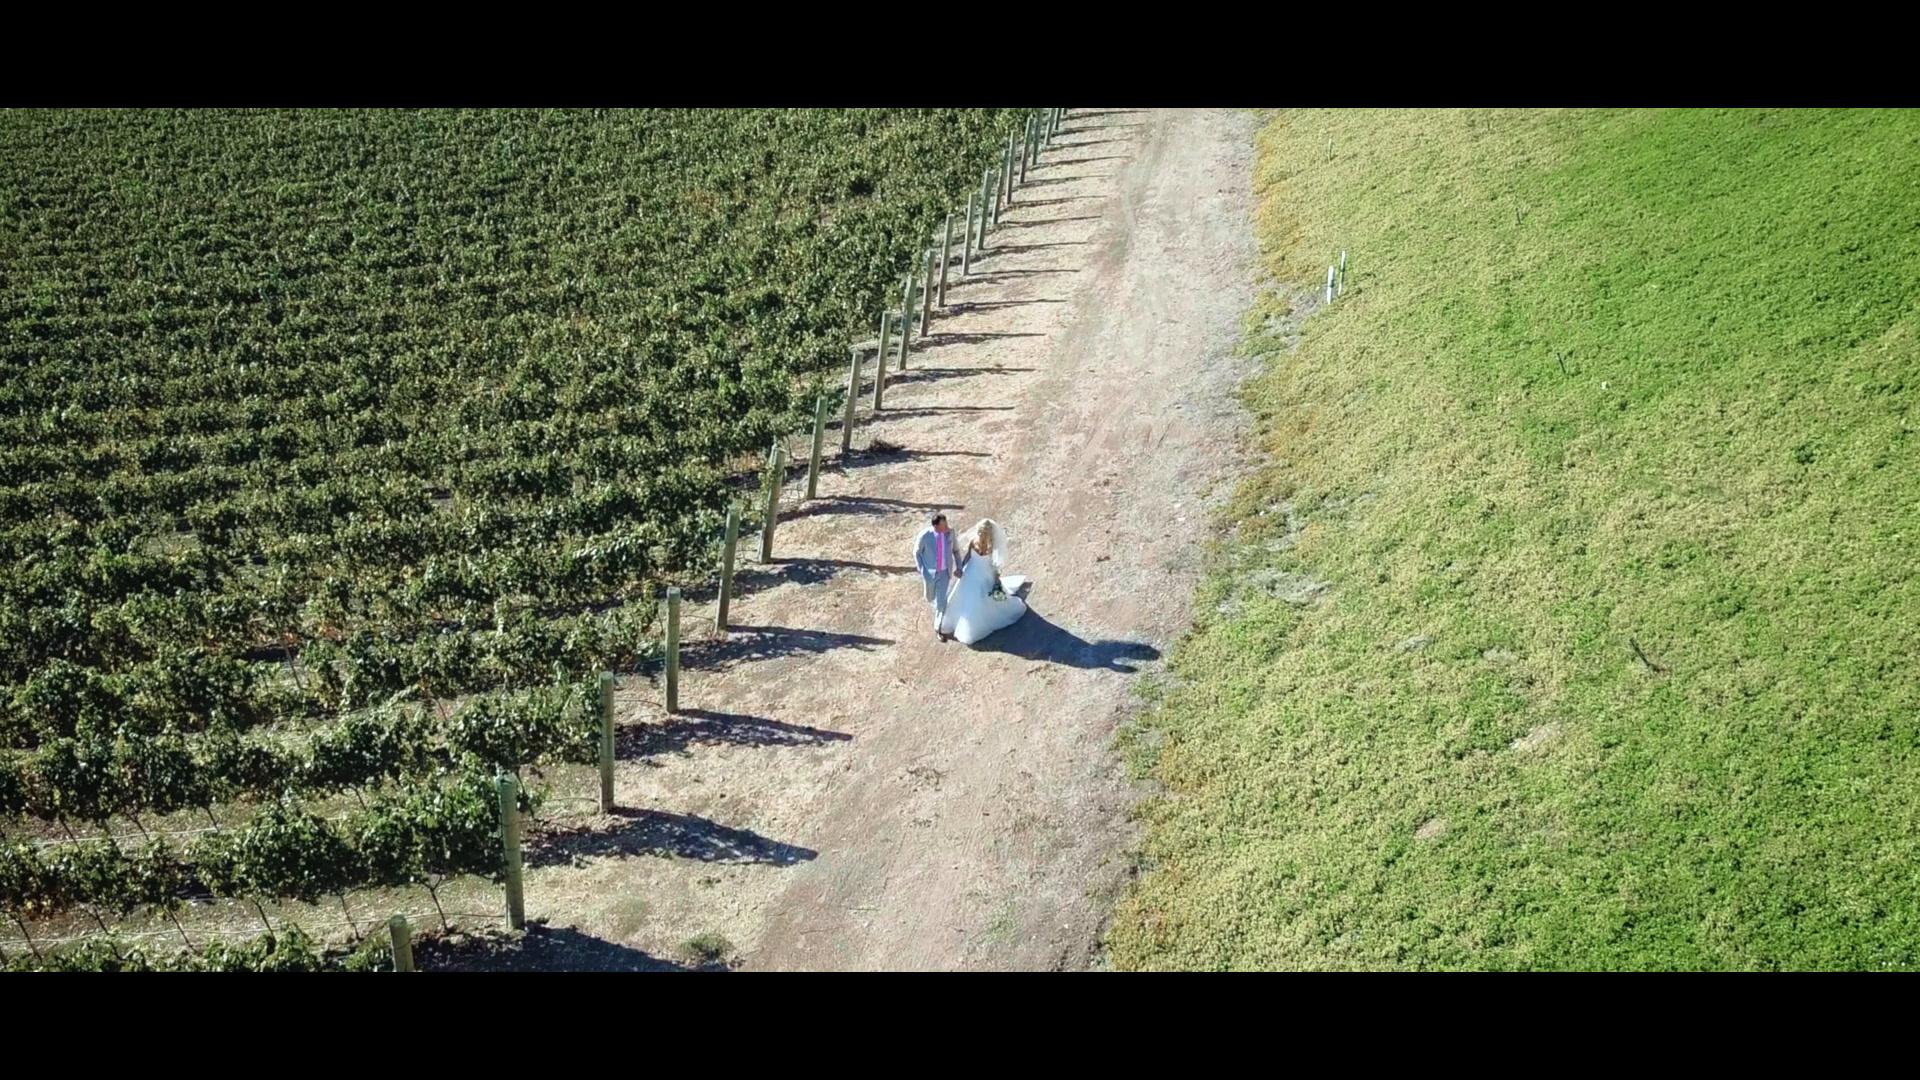 Corinne + Michael | Rancho Palos Verdes, California | Catalina View Gardens